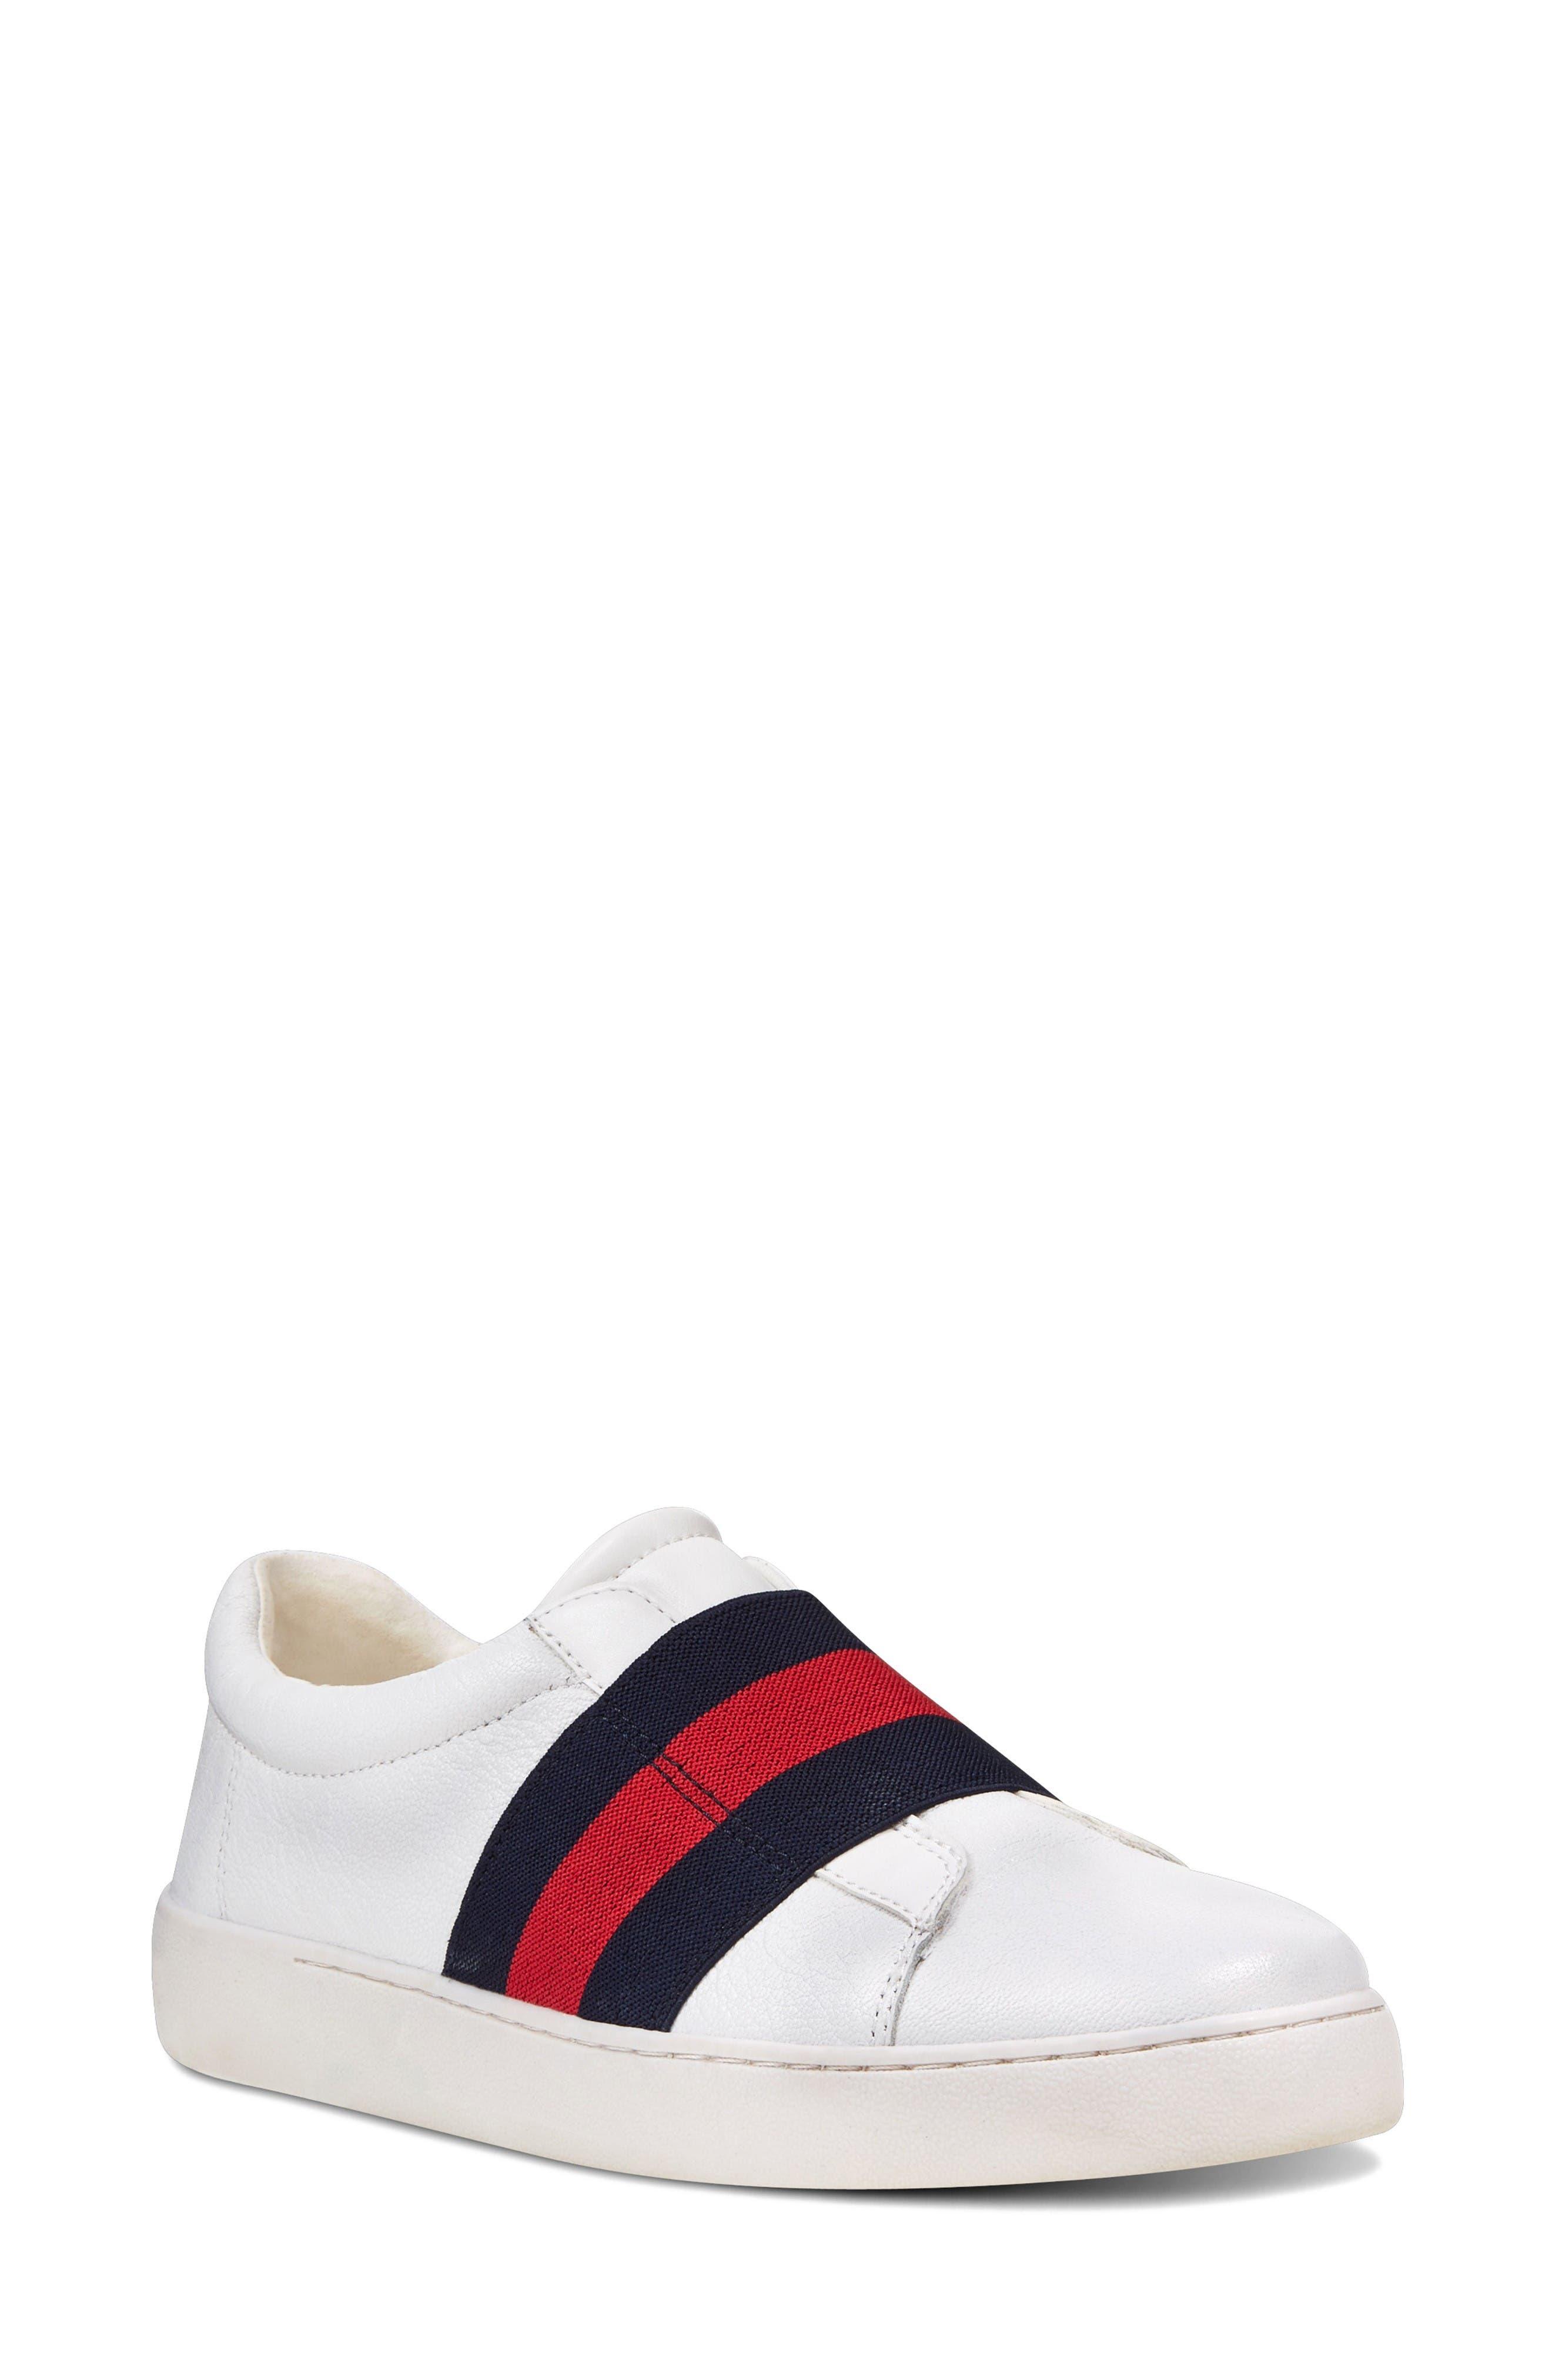 Main Image - Nine West Pirin Slip-On Sneaker (Women)